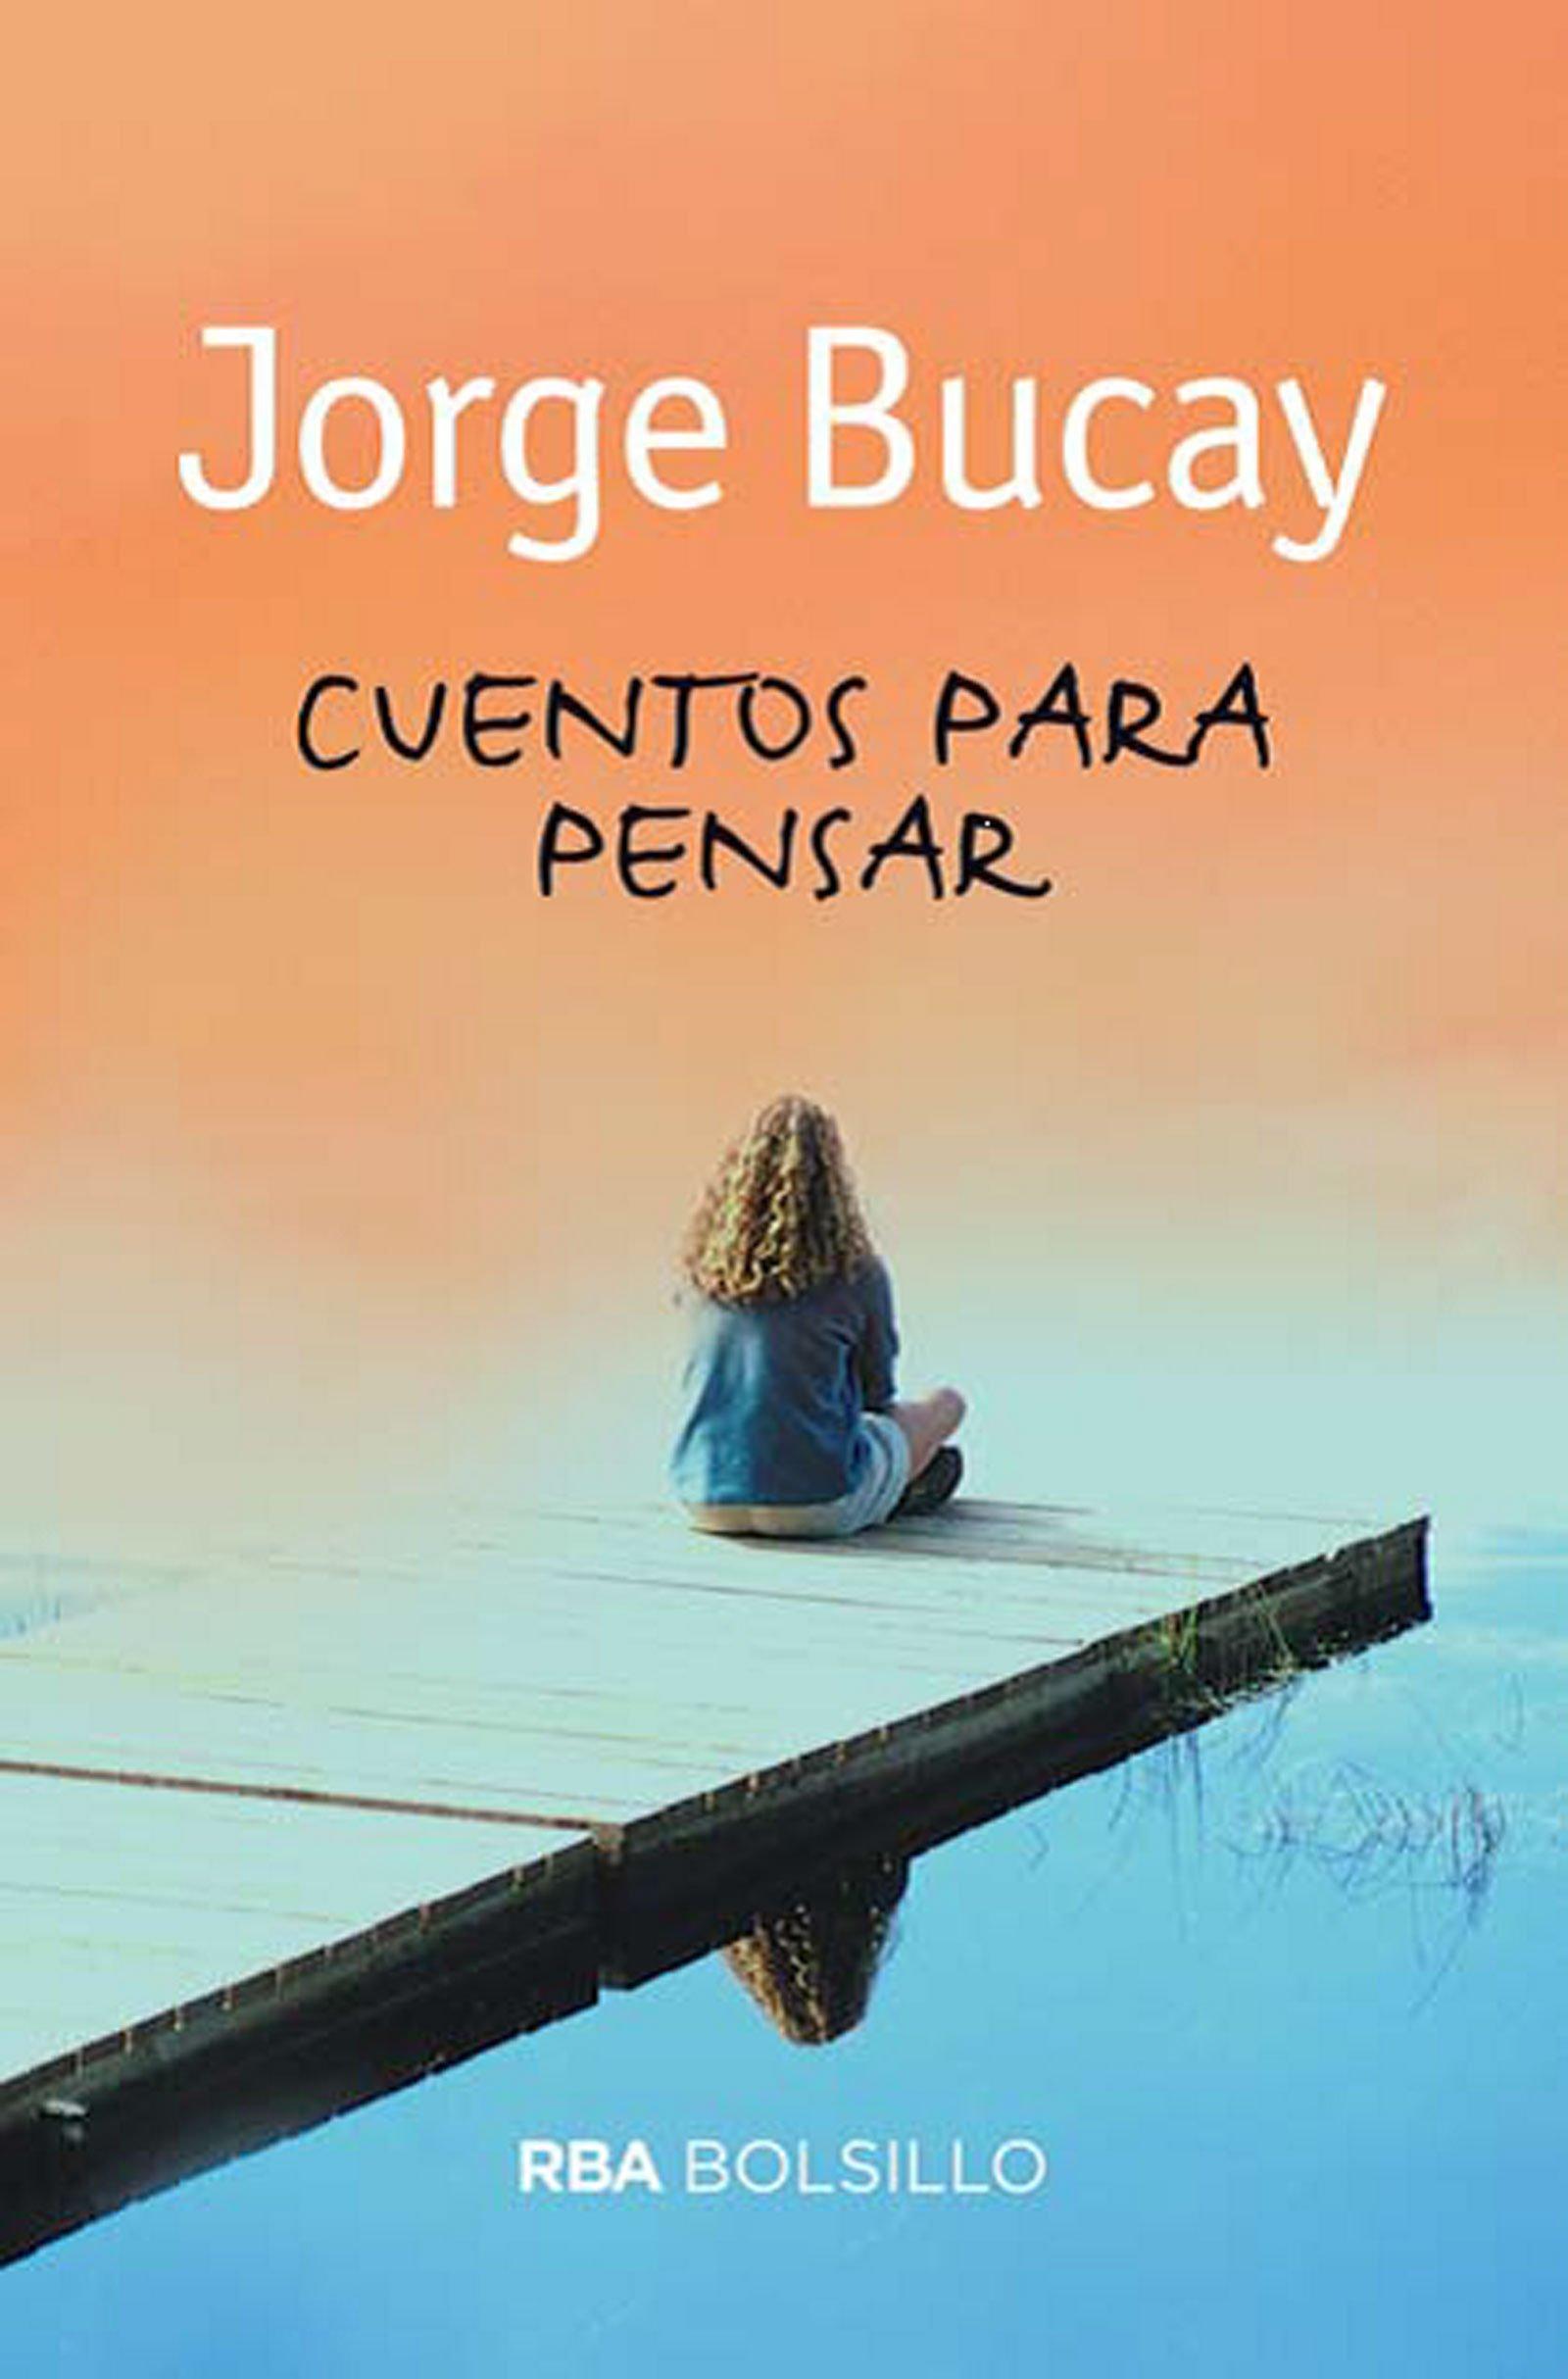 Cuentos para pensar: BUCAY, JORGE: 9788492966776: Amazon.com: Books